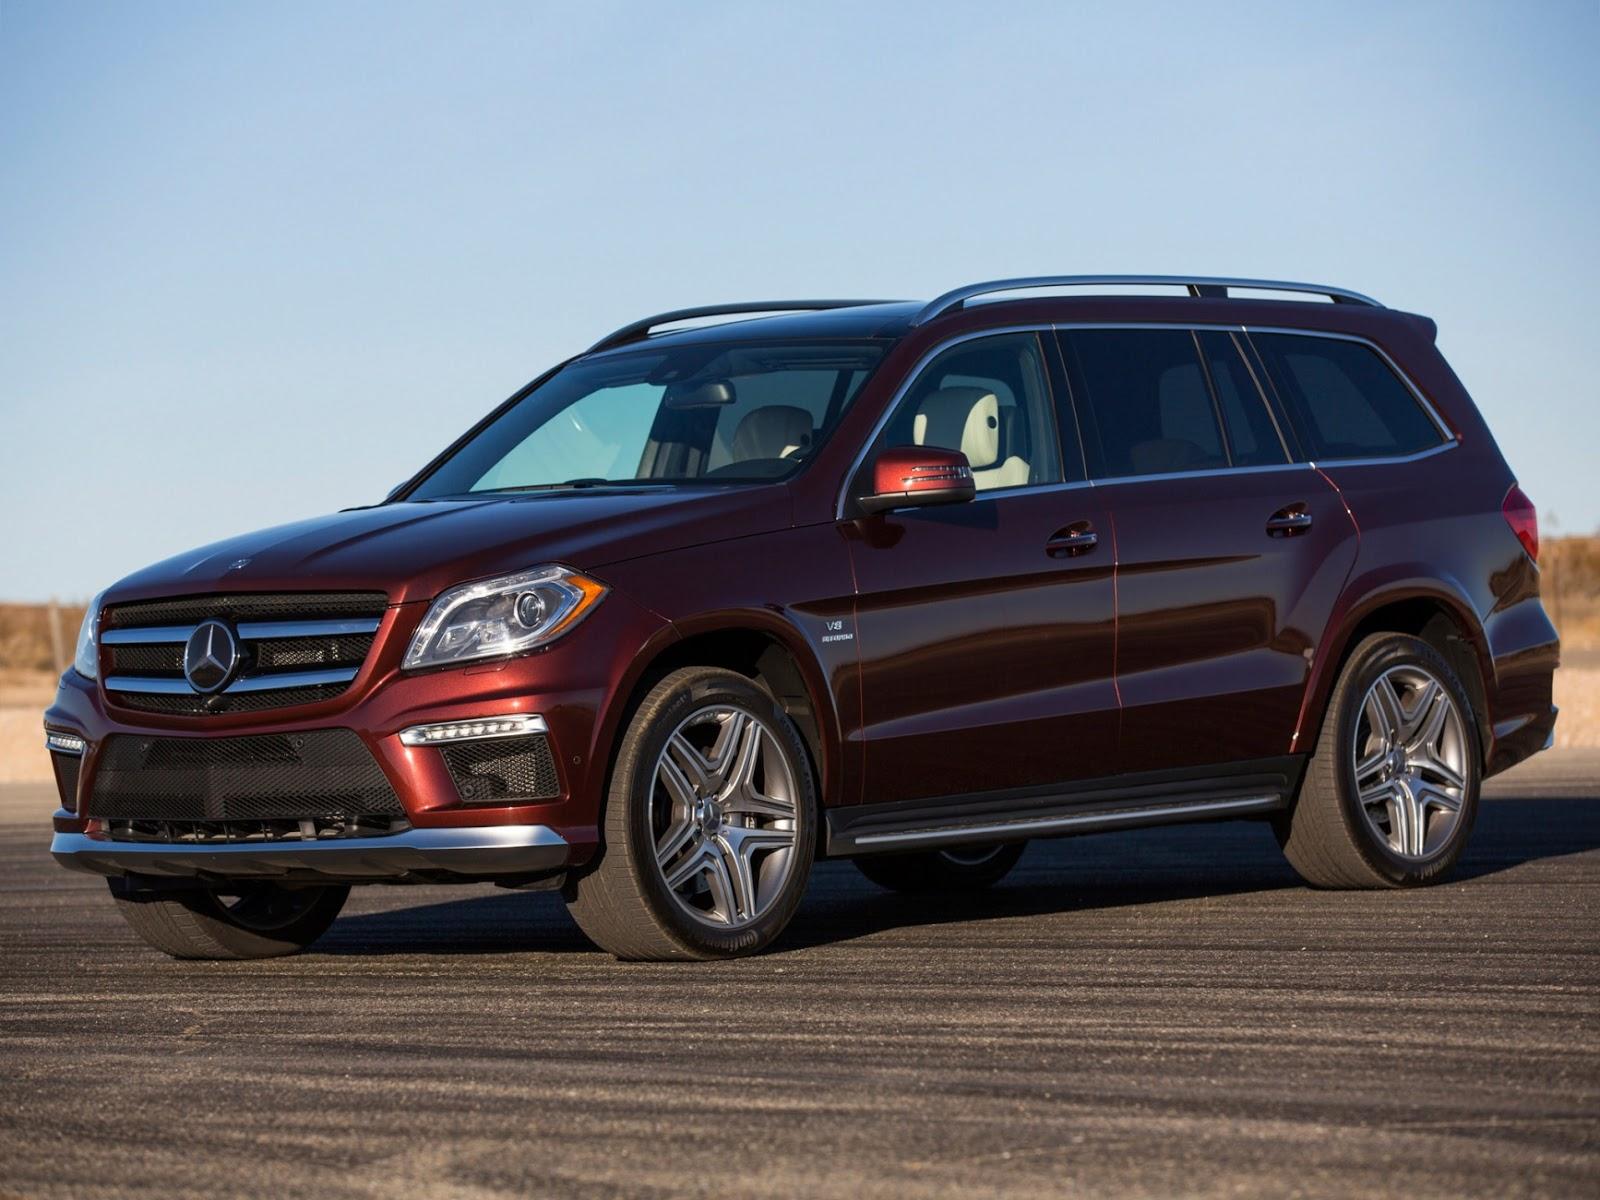 All cars nz 2013 mercedes benz gl63 x166 amg for Mercedes benz all